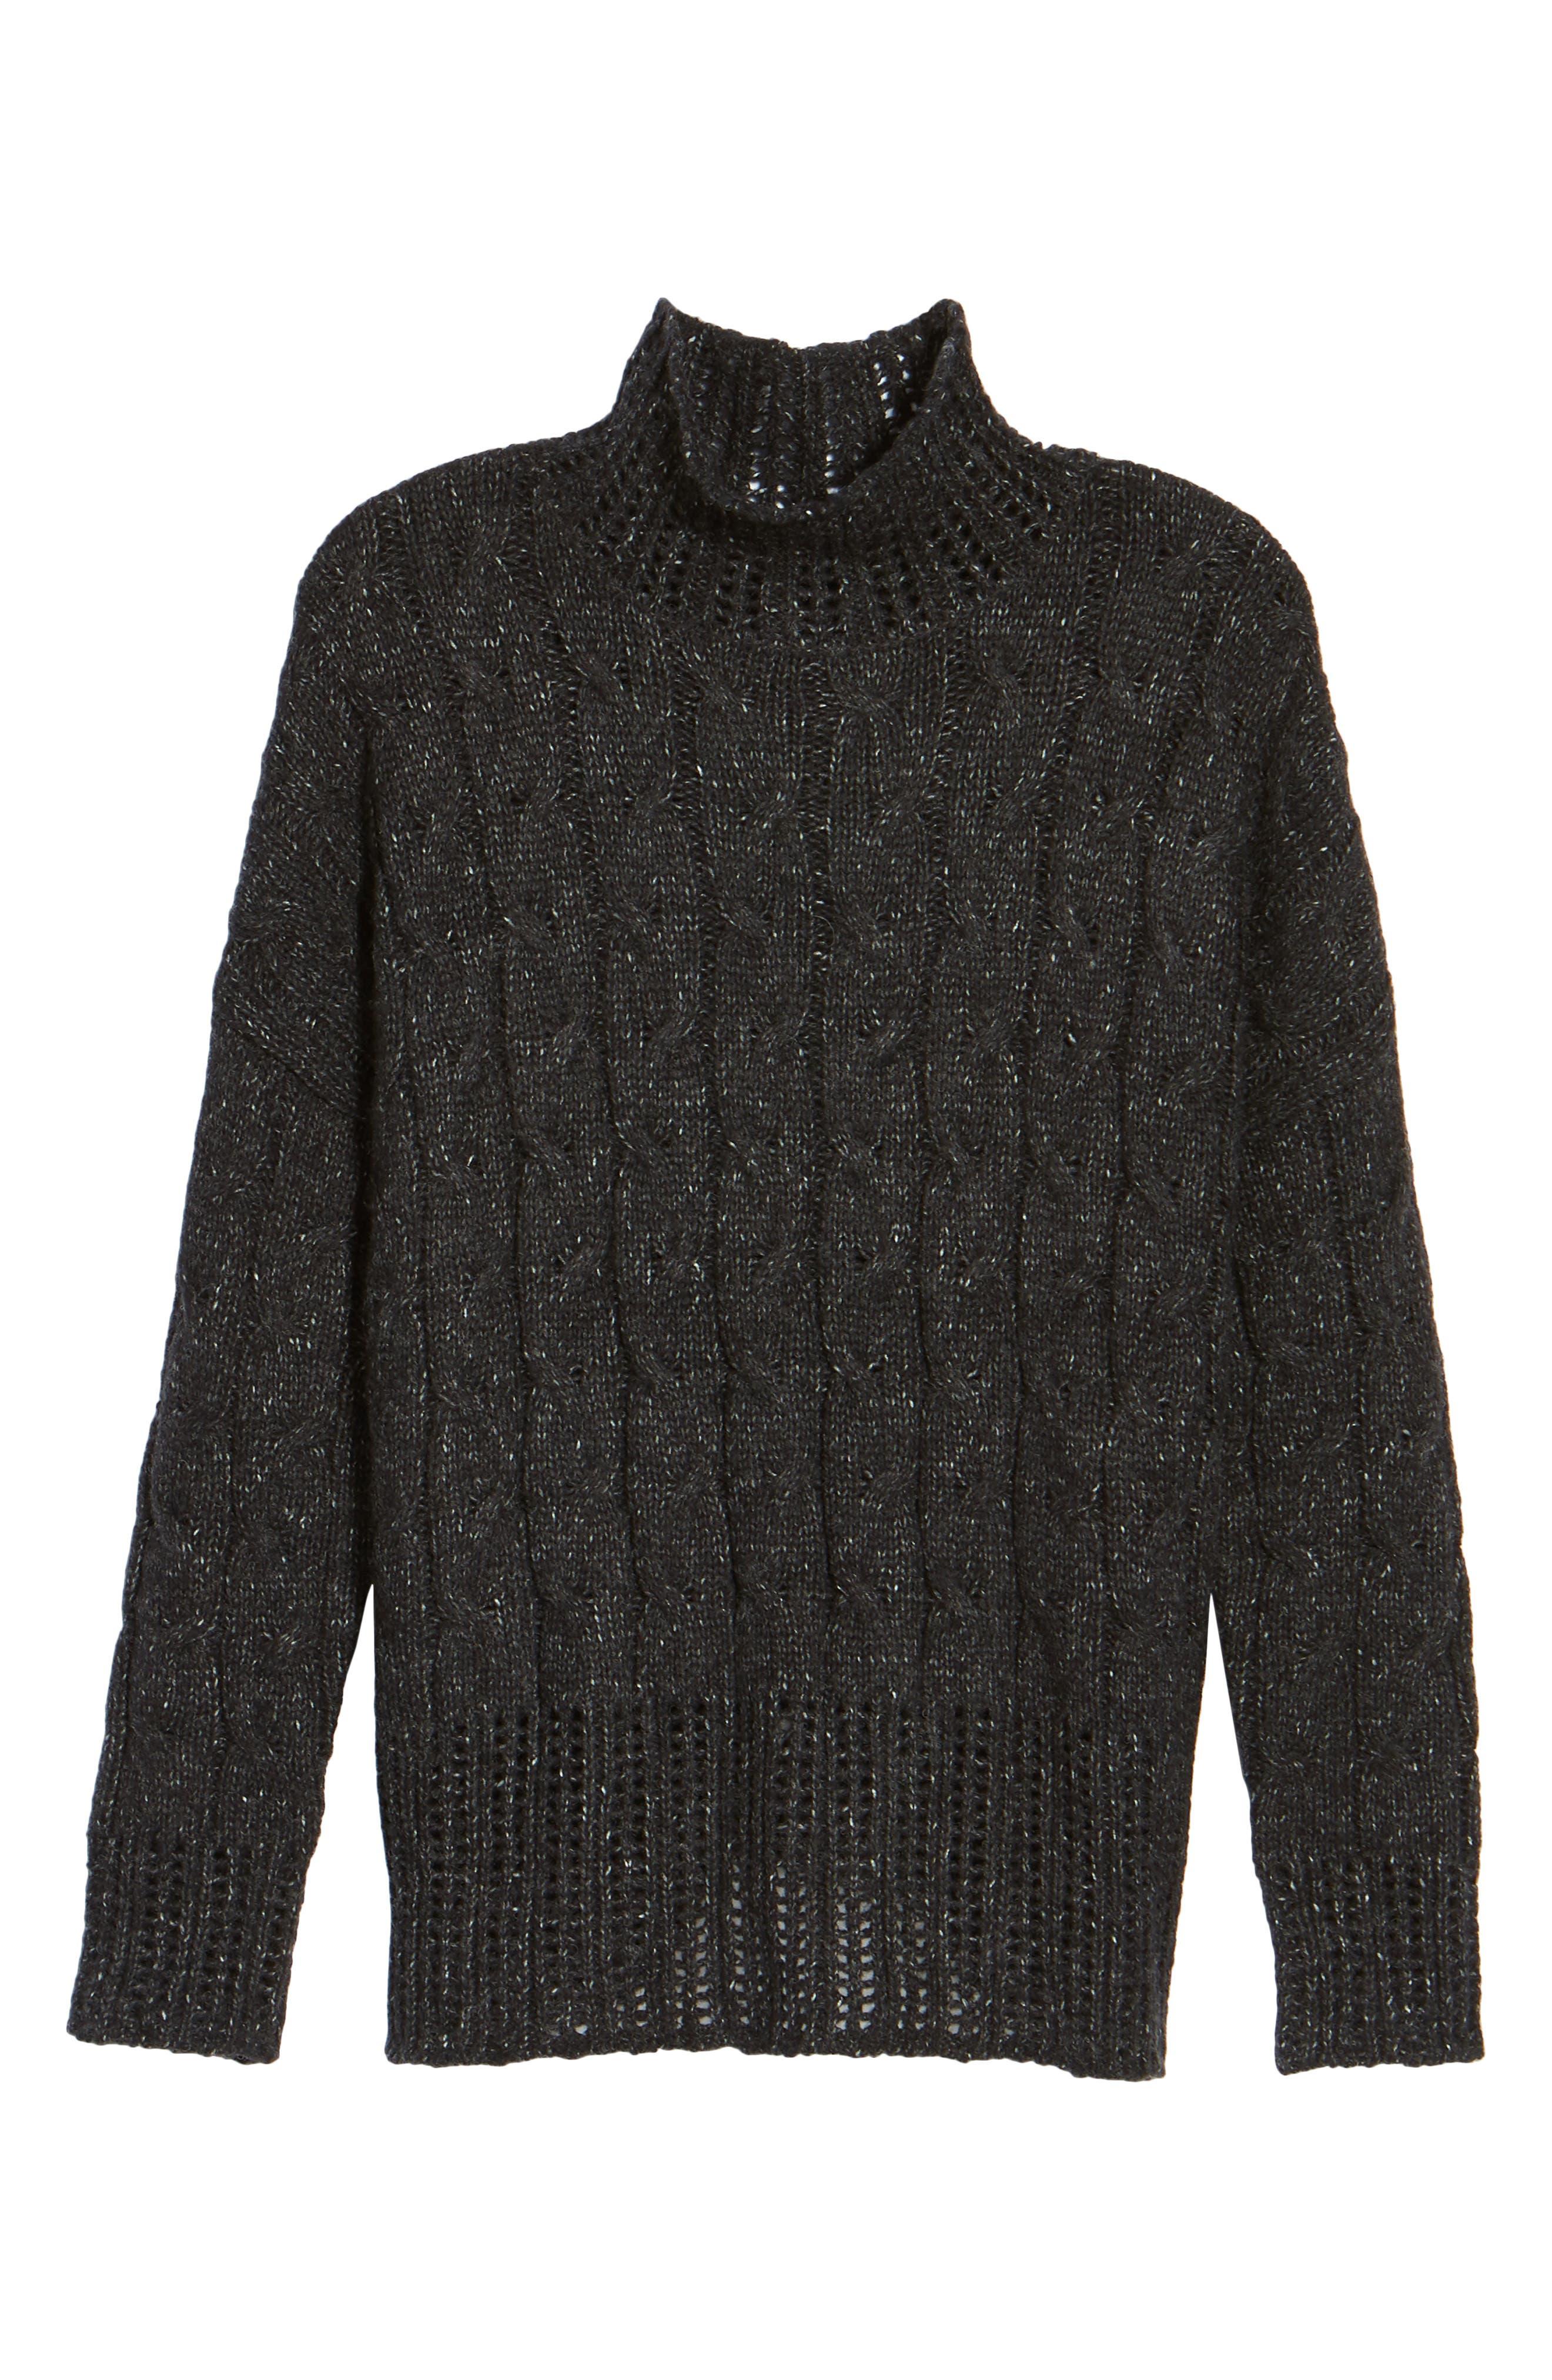 Pointelle Turtleneck Sweater,                             Alternate thumbnail 6, color,                             001